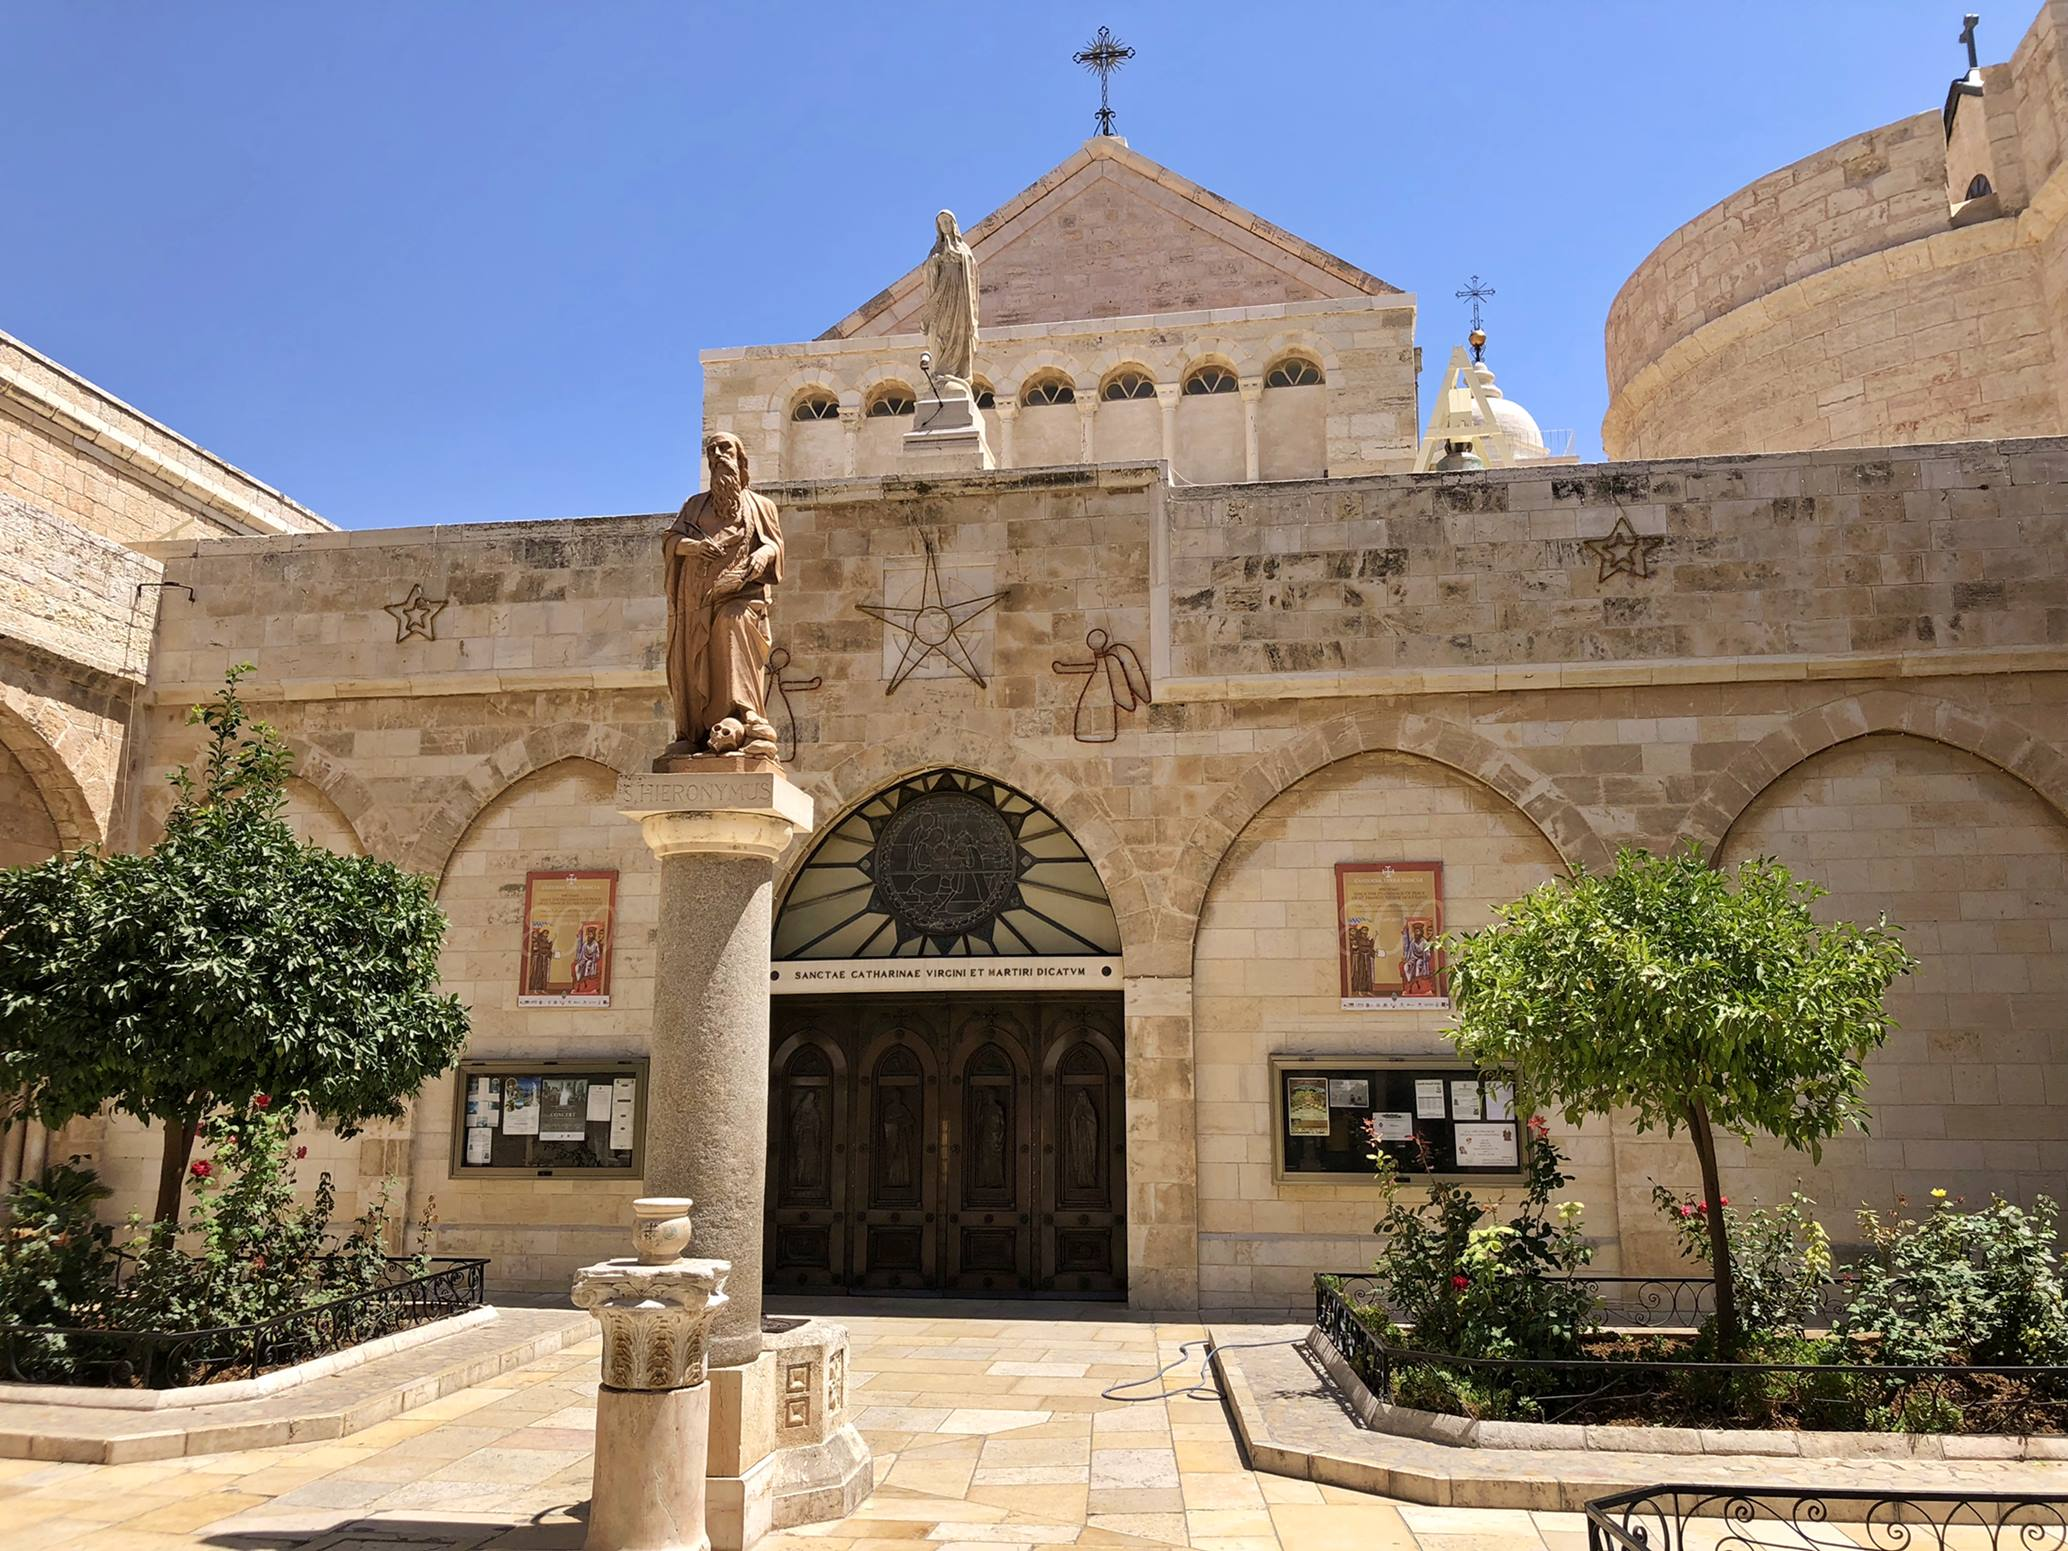 belem_palestina_igrejadesantacatarina_1a